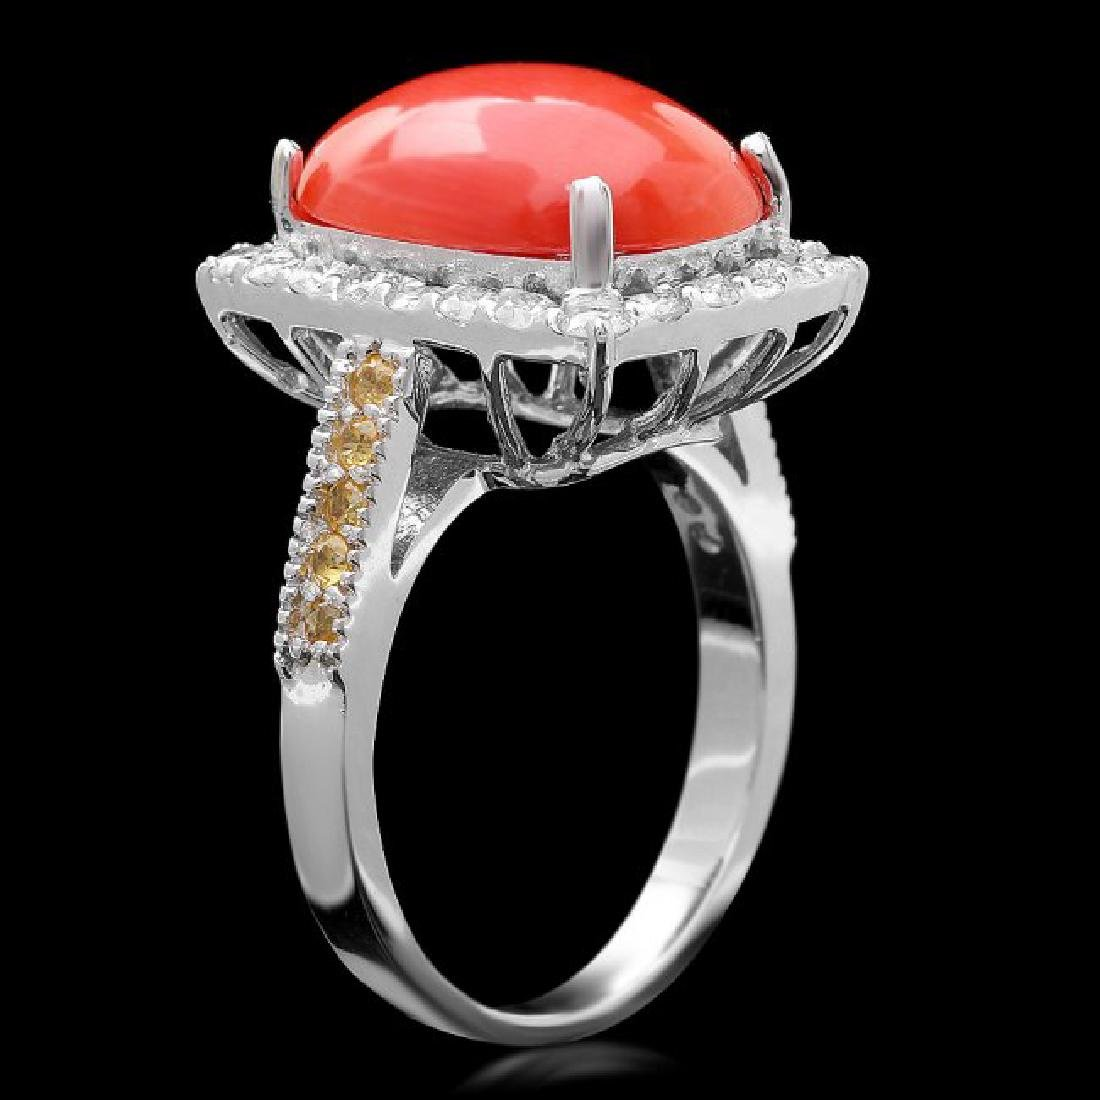 14k White Gold 5.50ct Coral 1.00ct Diamond Ring - 3